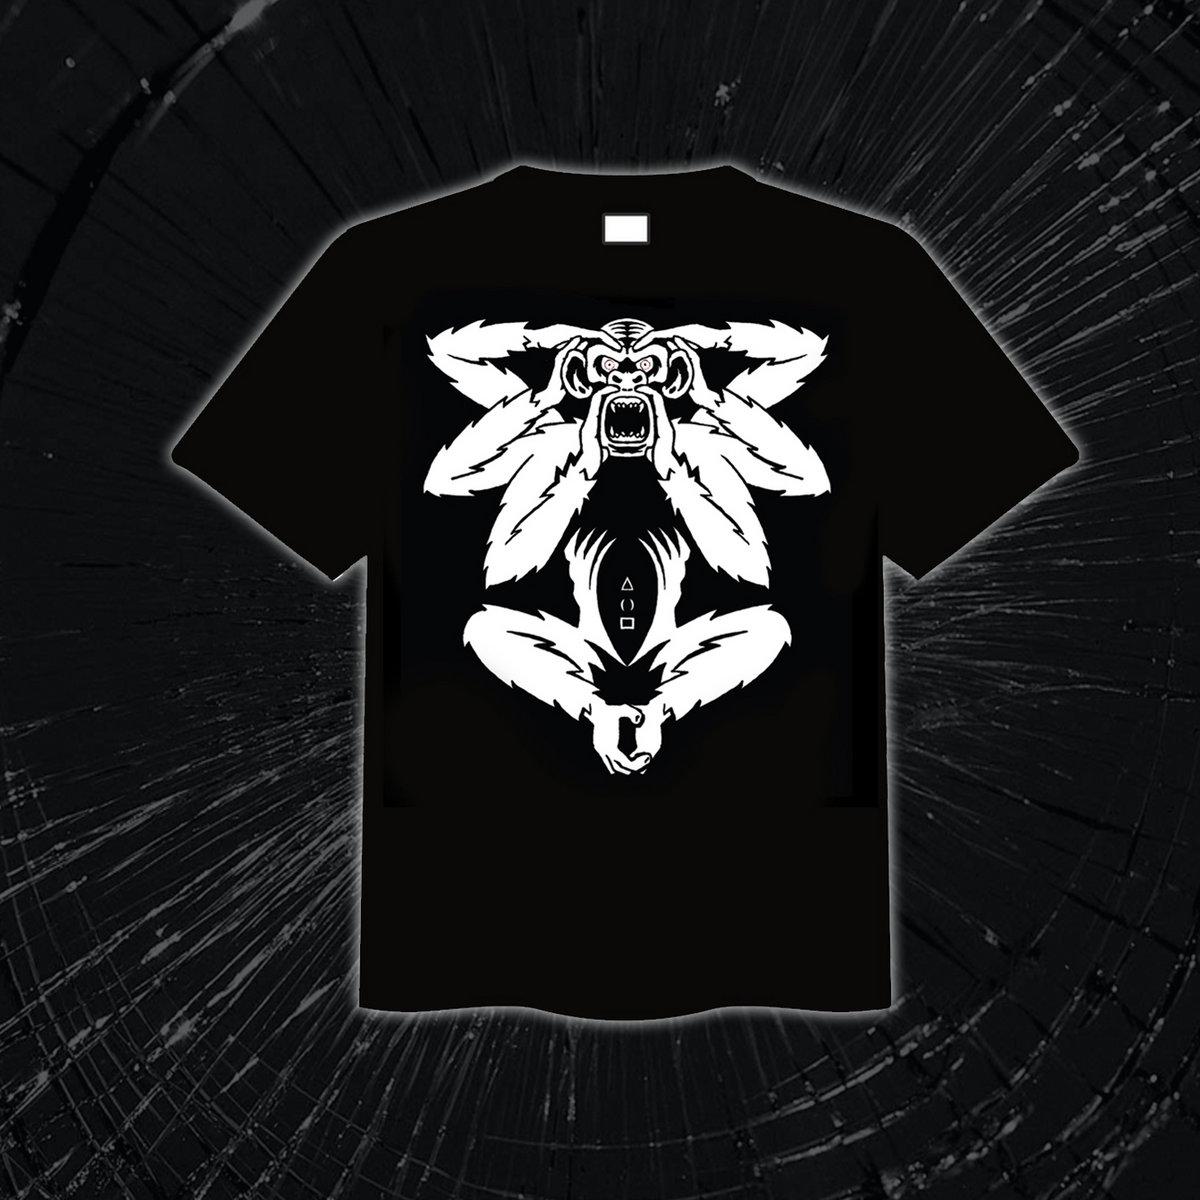 Design t shirt glow in the dark - Deformer Glow In The Dark T Shirt Main Photo